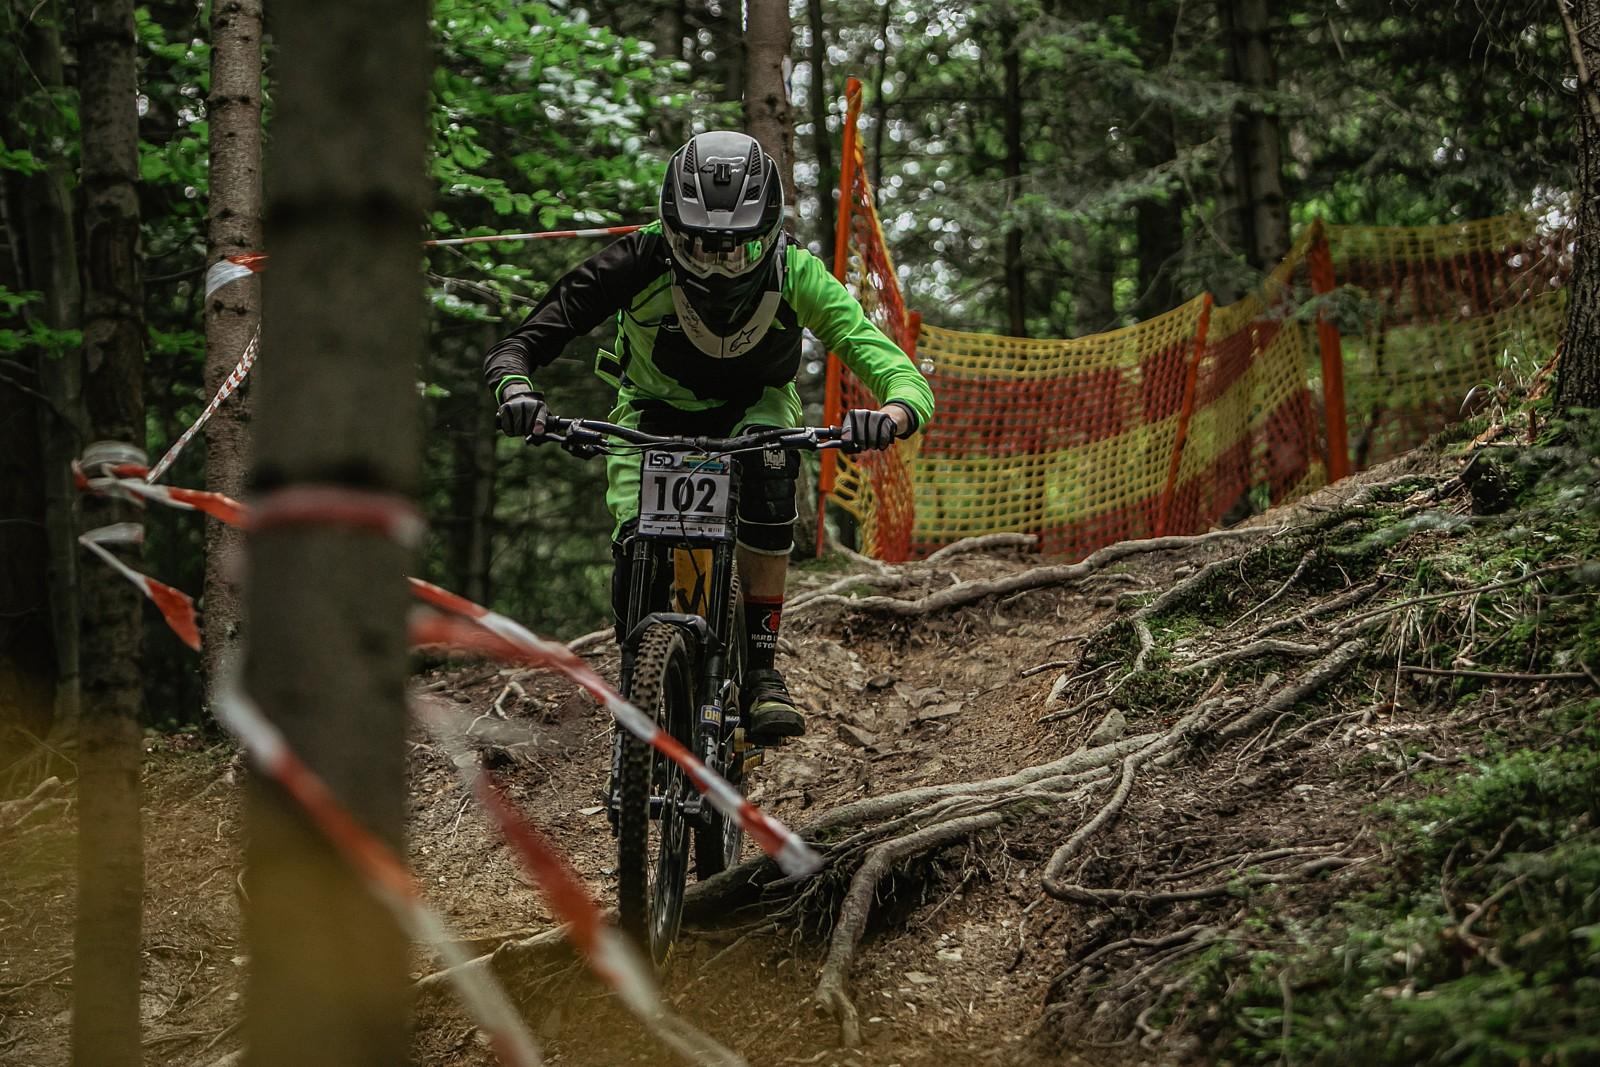 Local Series of Downhill 2 - bartek_zgr - Mountain Biking Pictures - Vital MTB